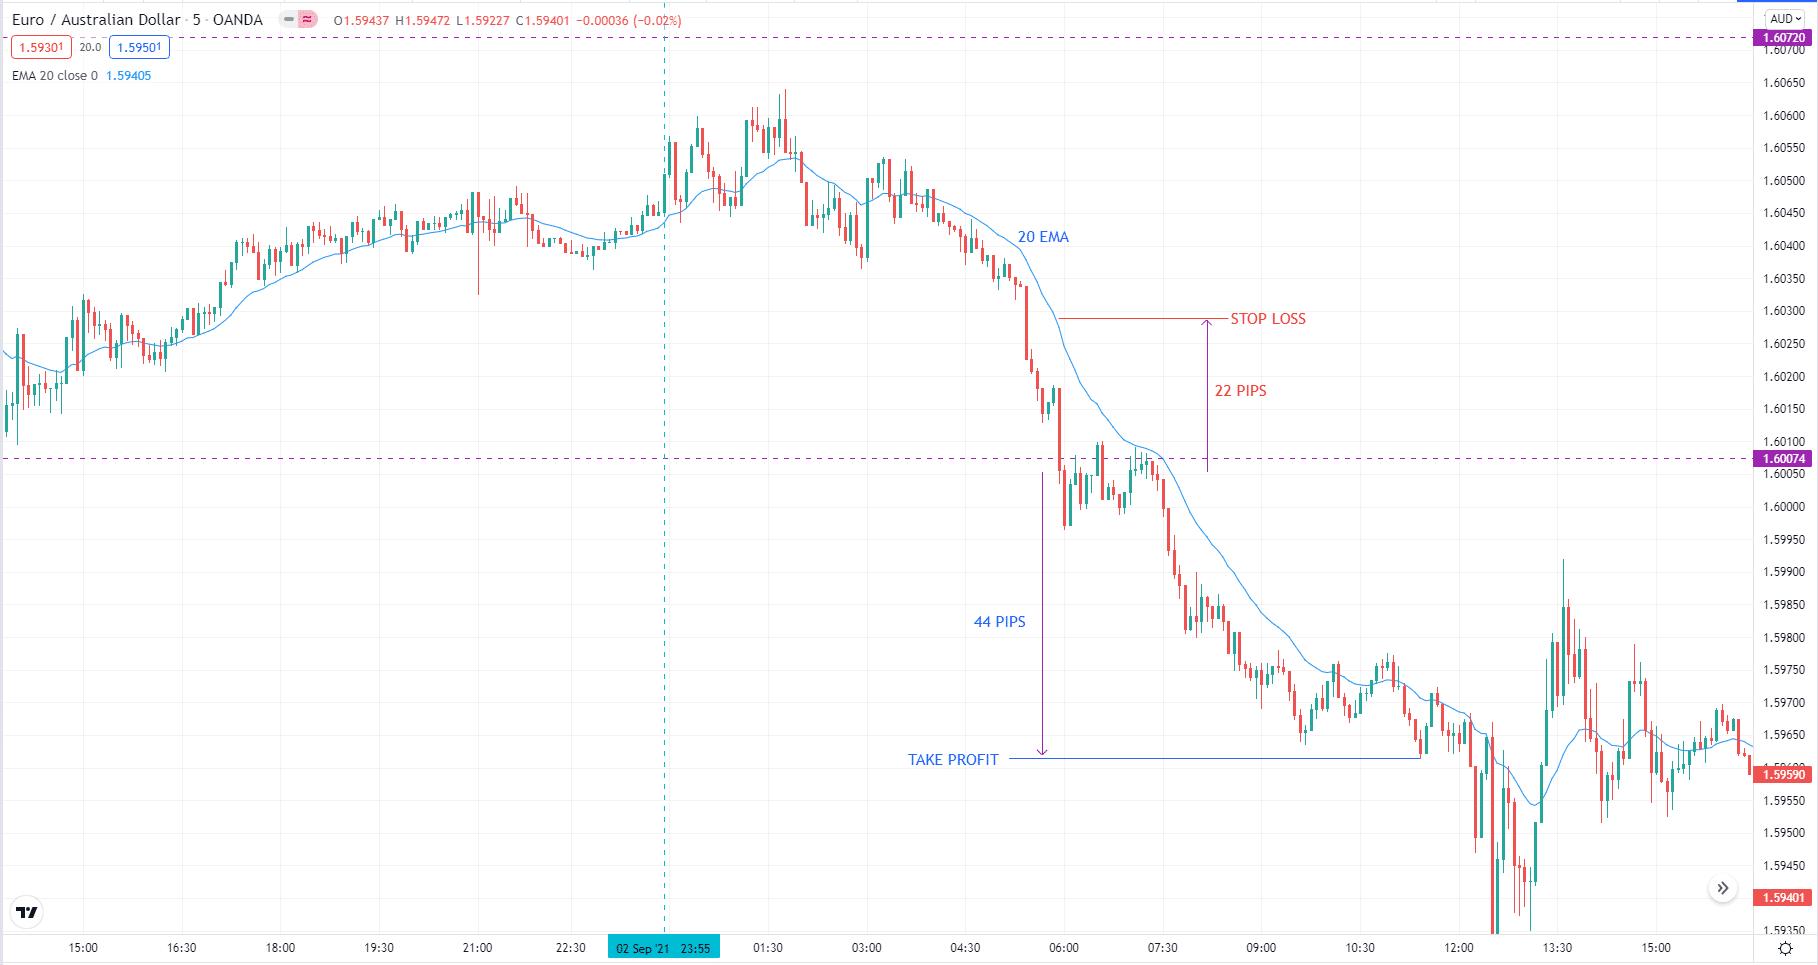 Euro/Australian dollar